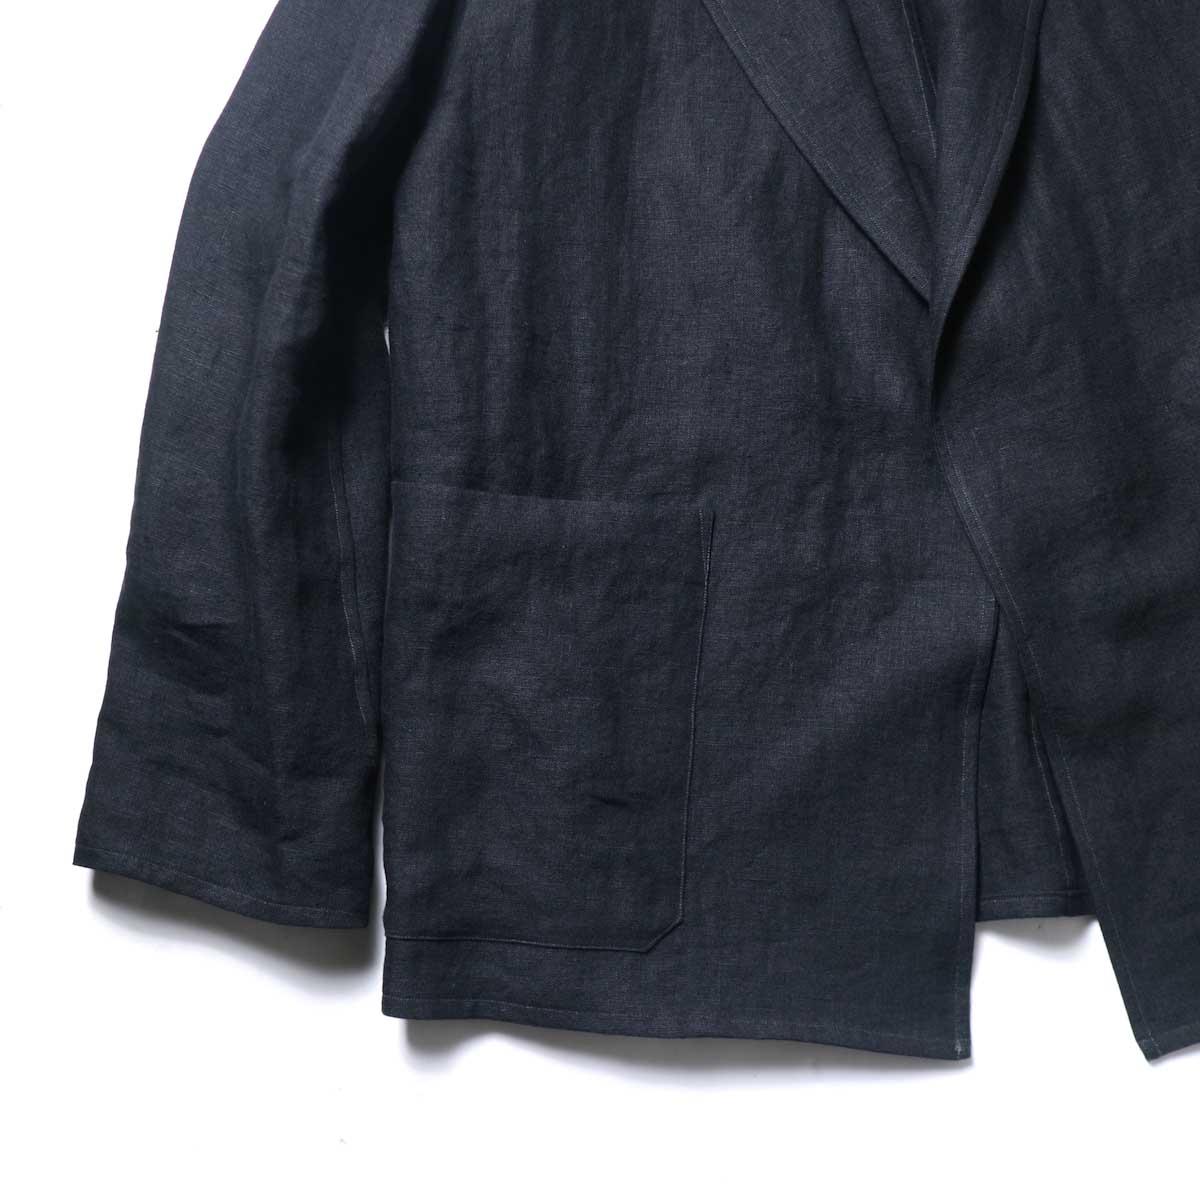 blurhms / Wash Linen Cardigan Jacket (Black)ポケット